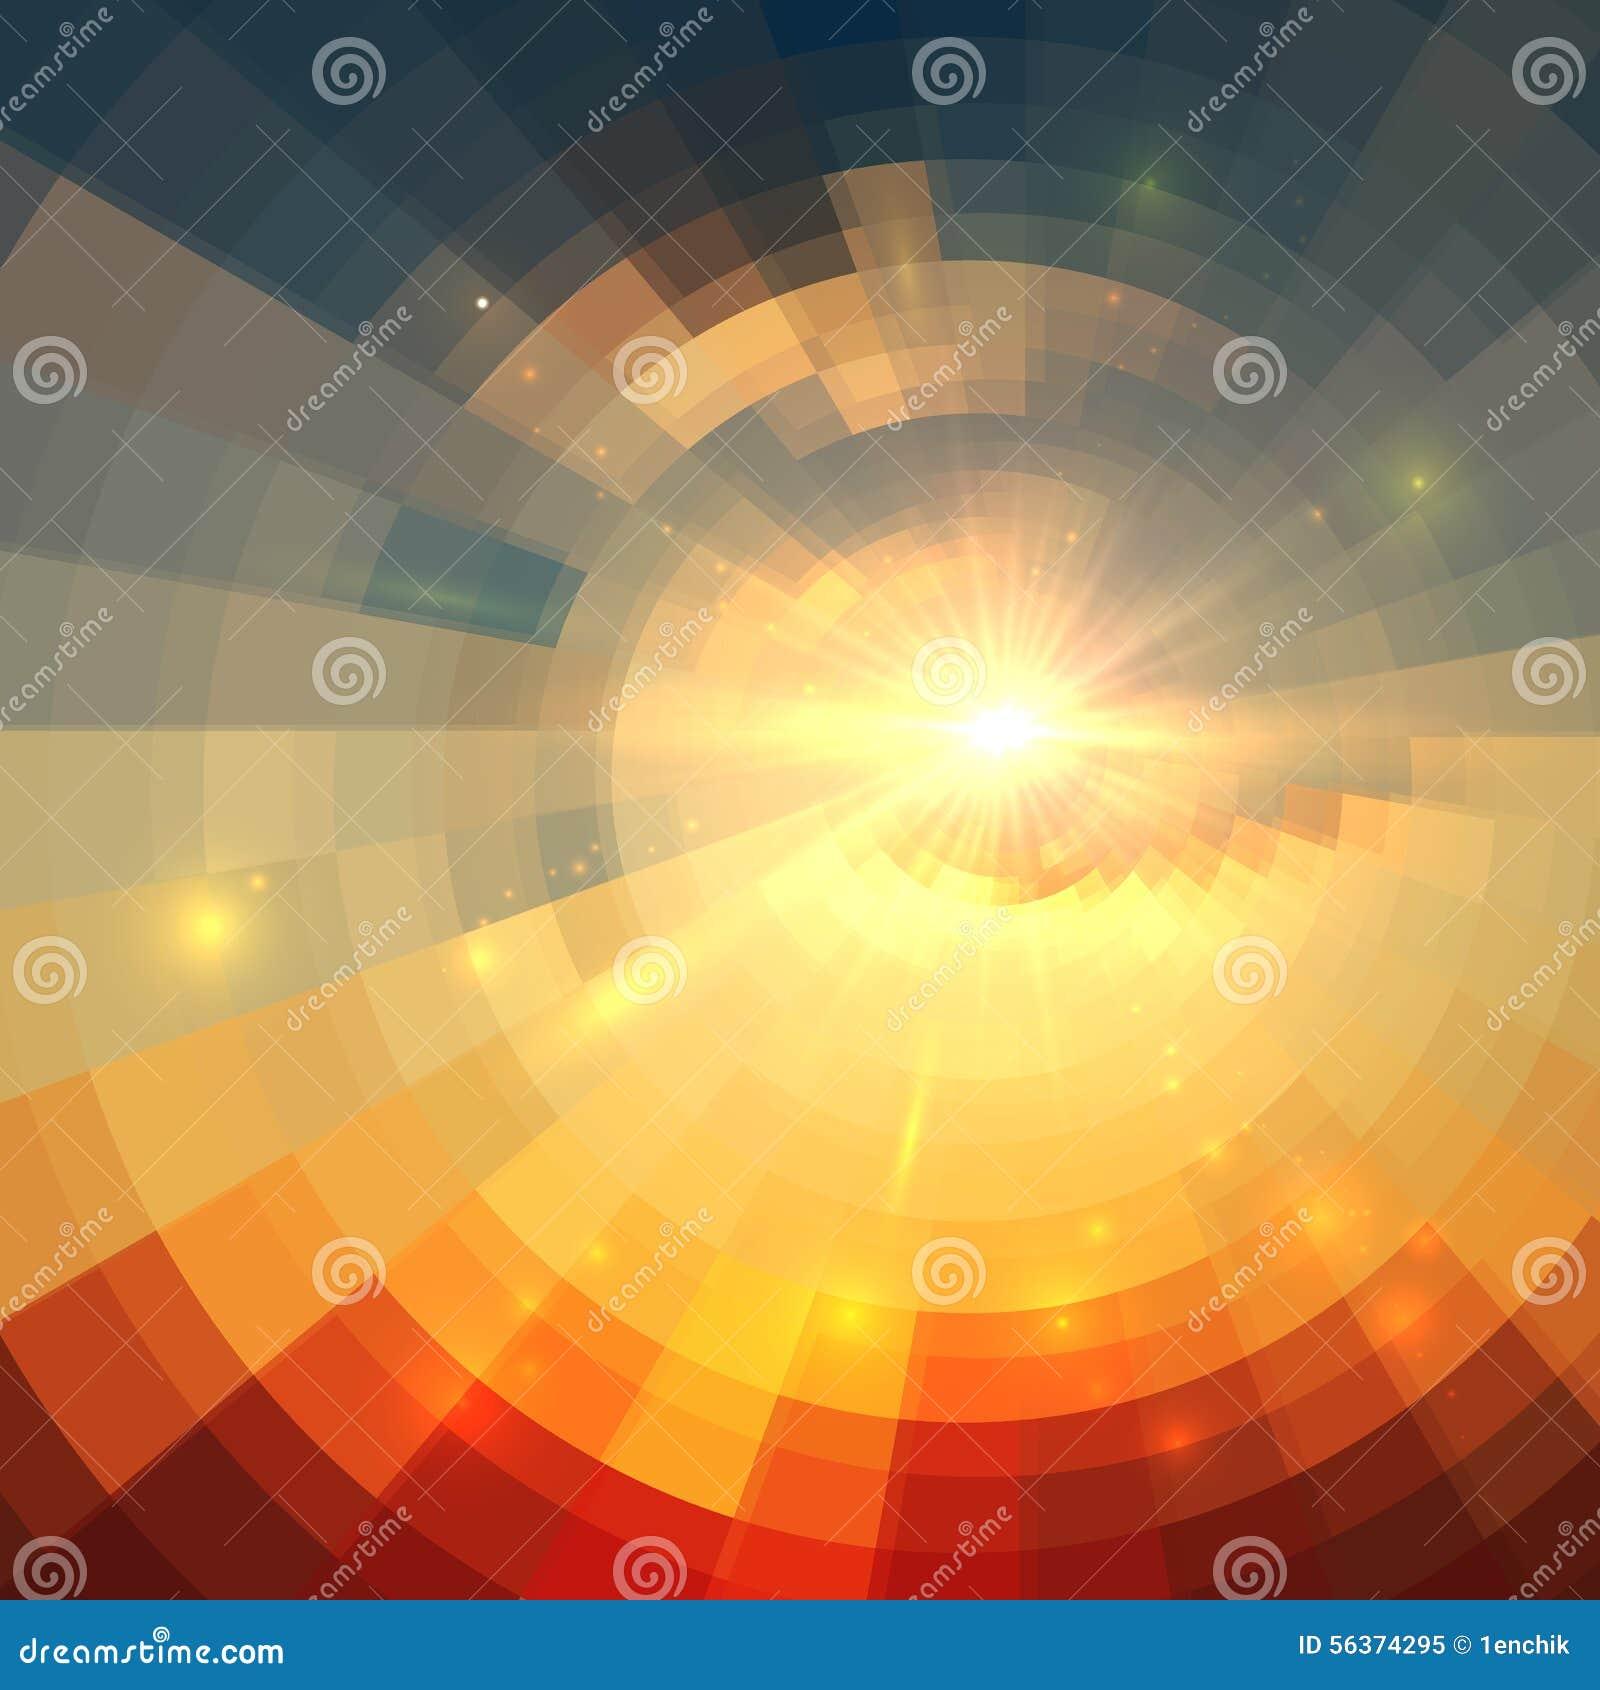 Abstract vector sunrise circle technology